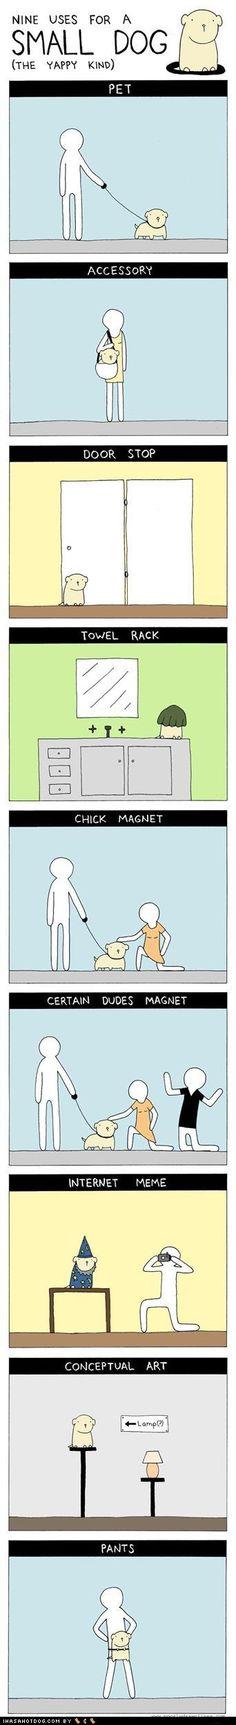 Nine uses for a small dog